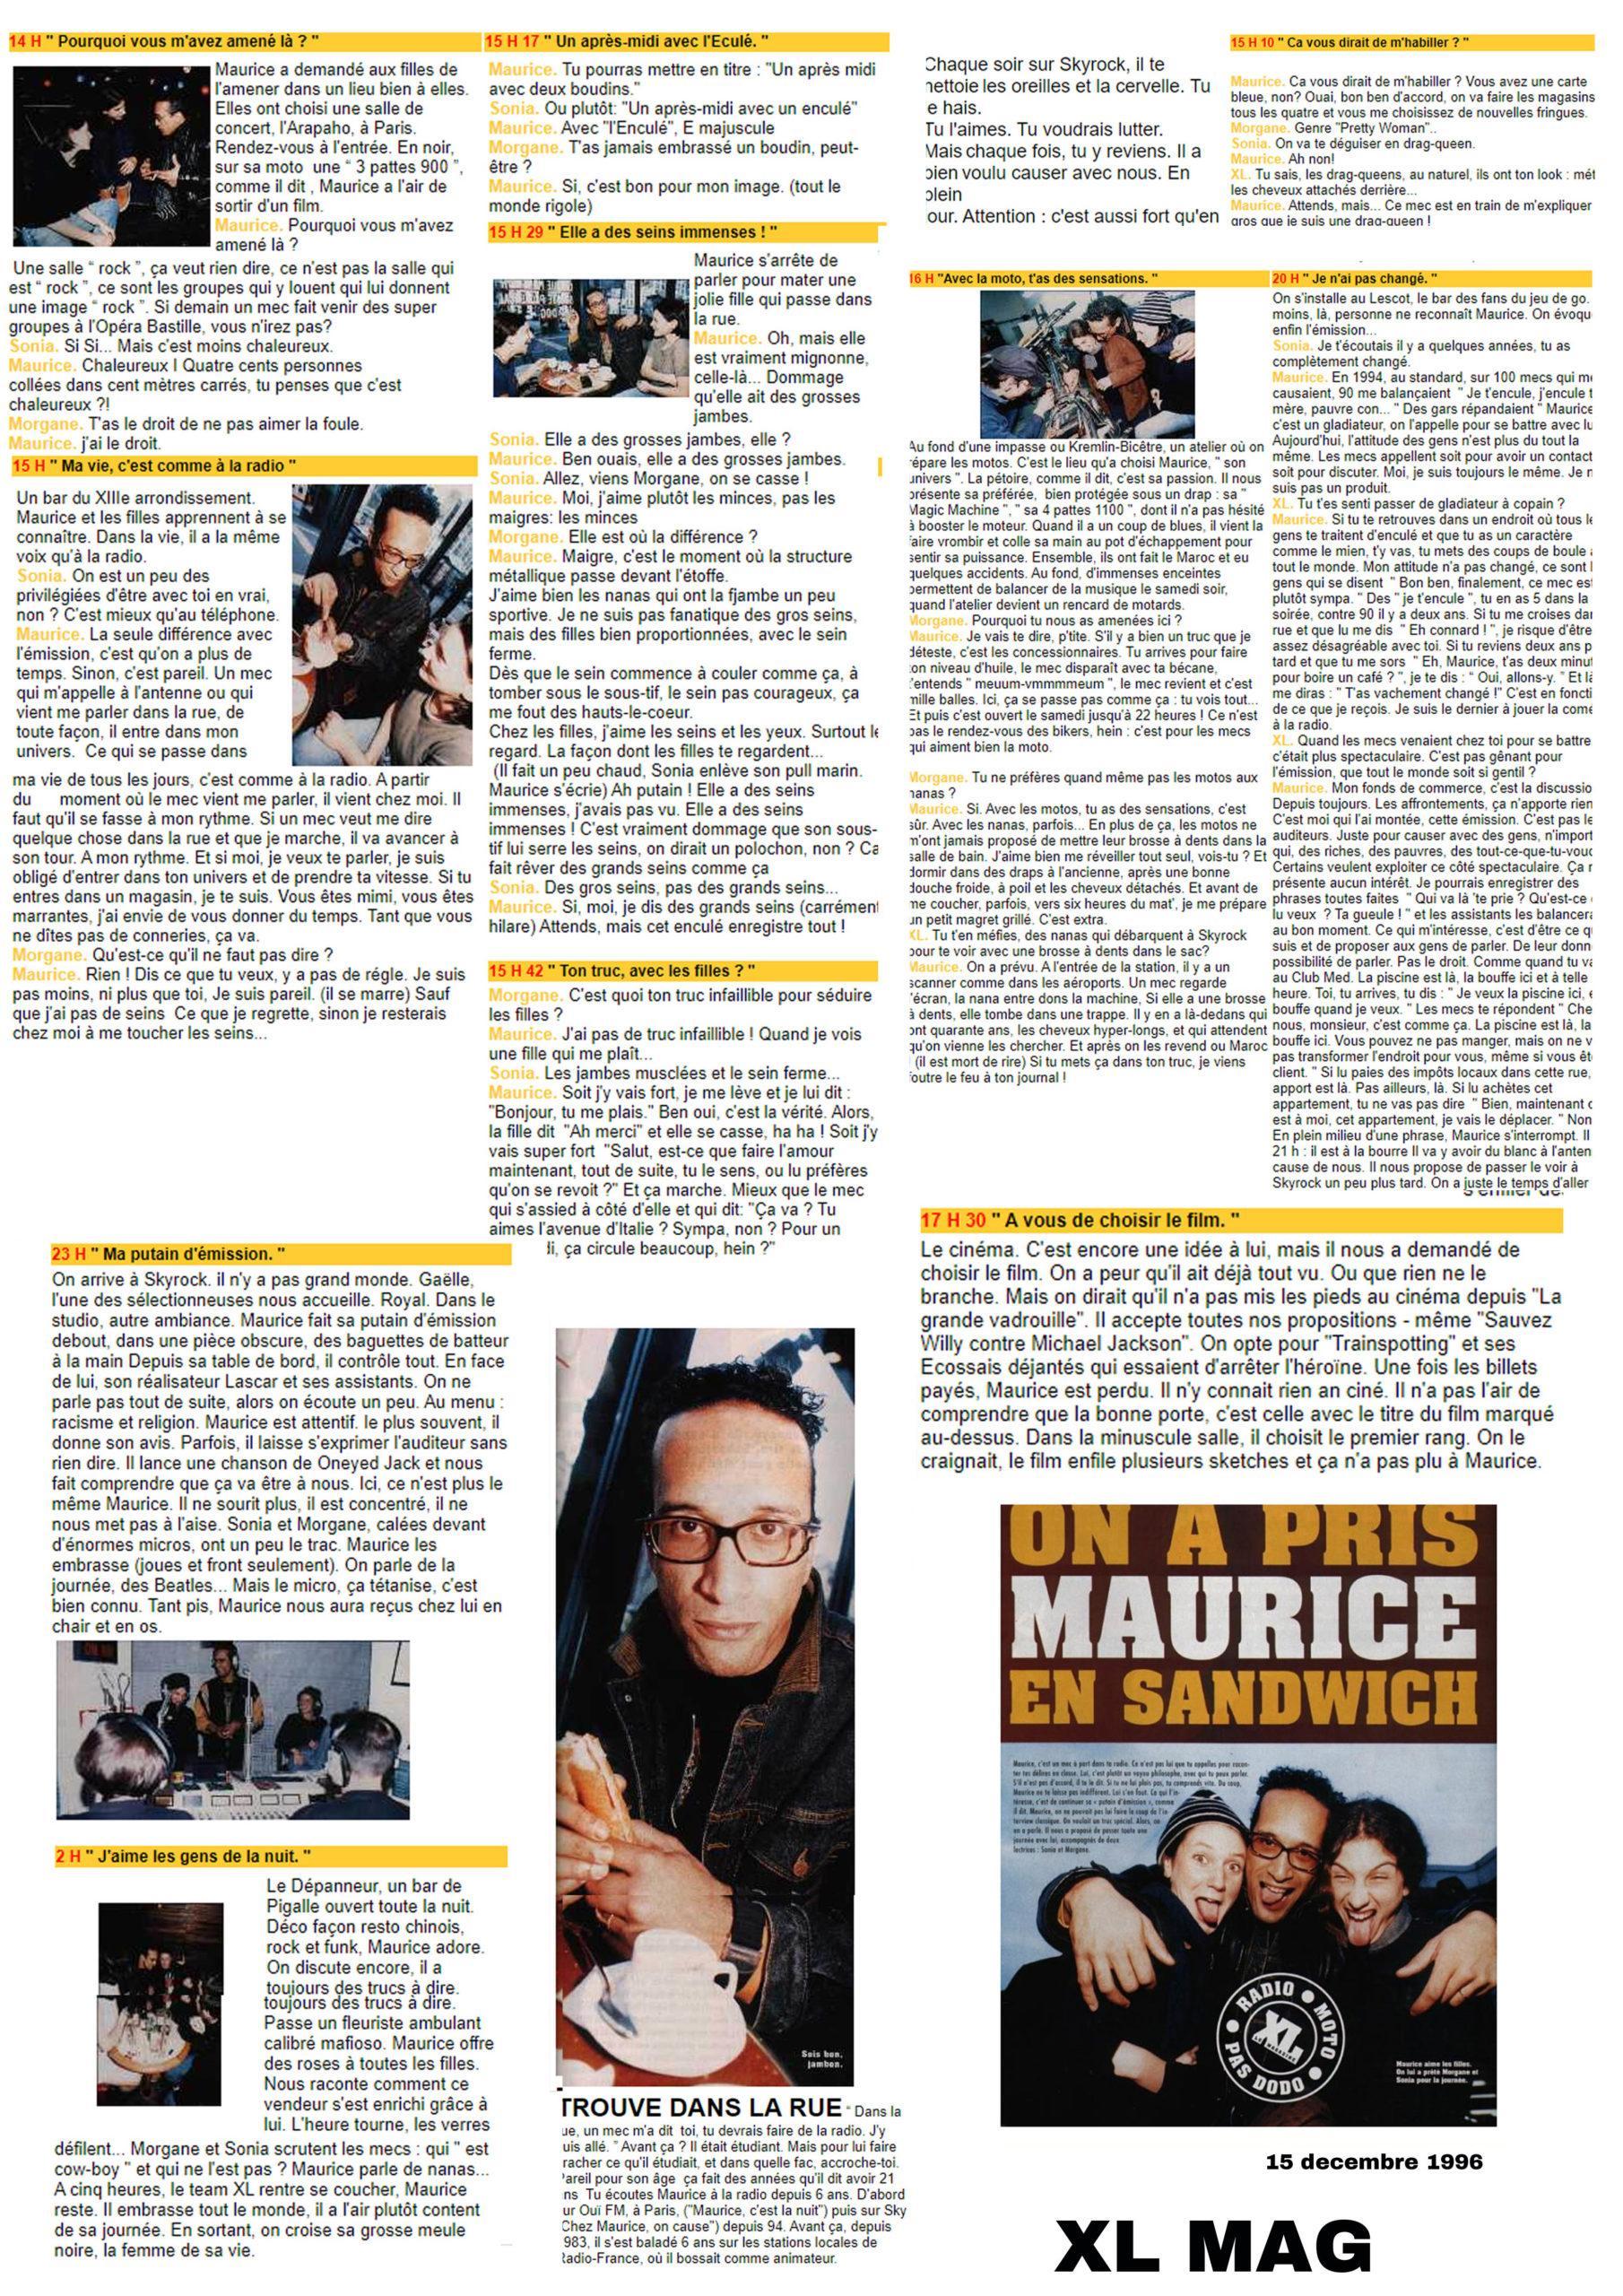 vignette XL Magazine On a pris Maurice en sandwich - 15/12/1998